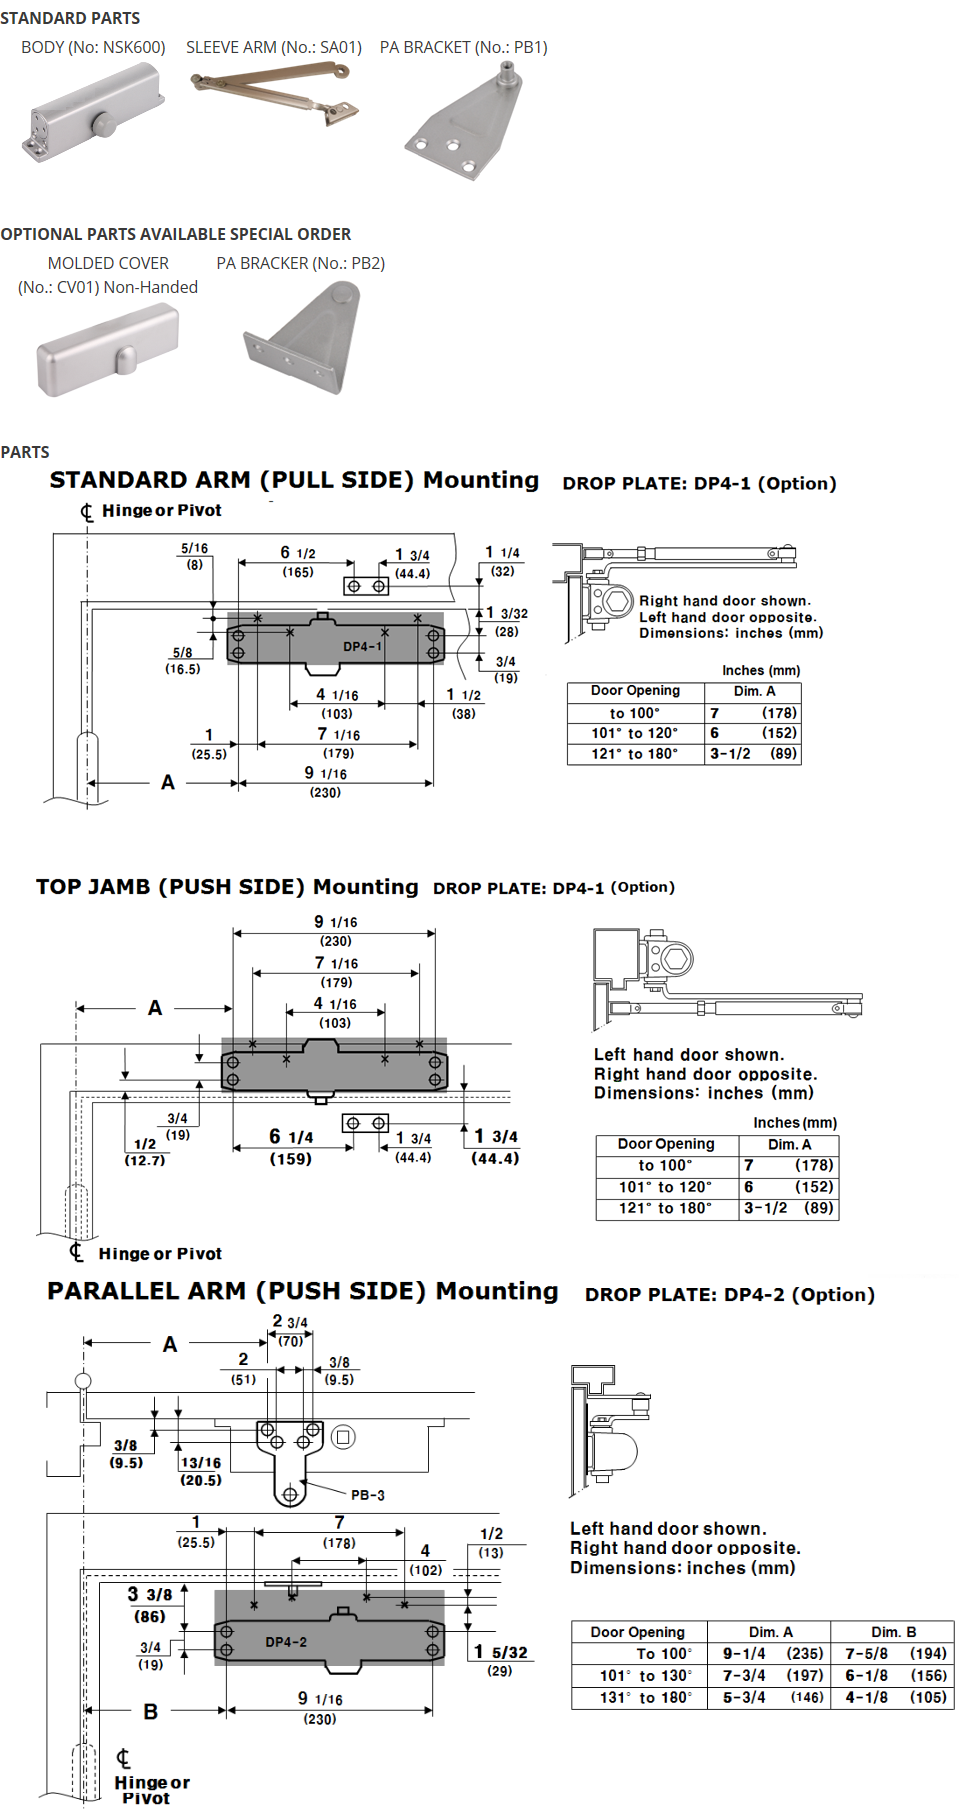 Sam Hwa Precision  NSK600 Series 1